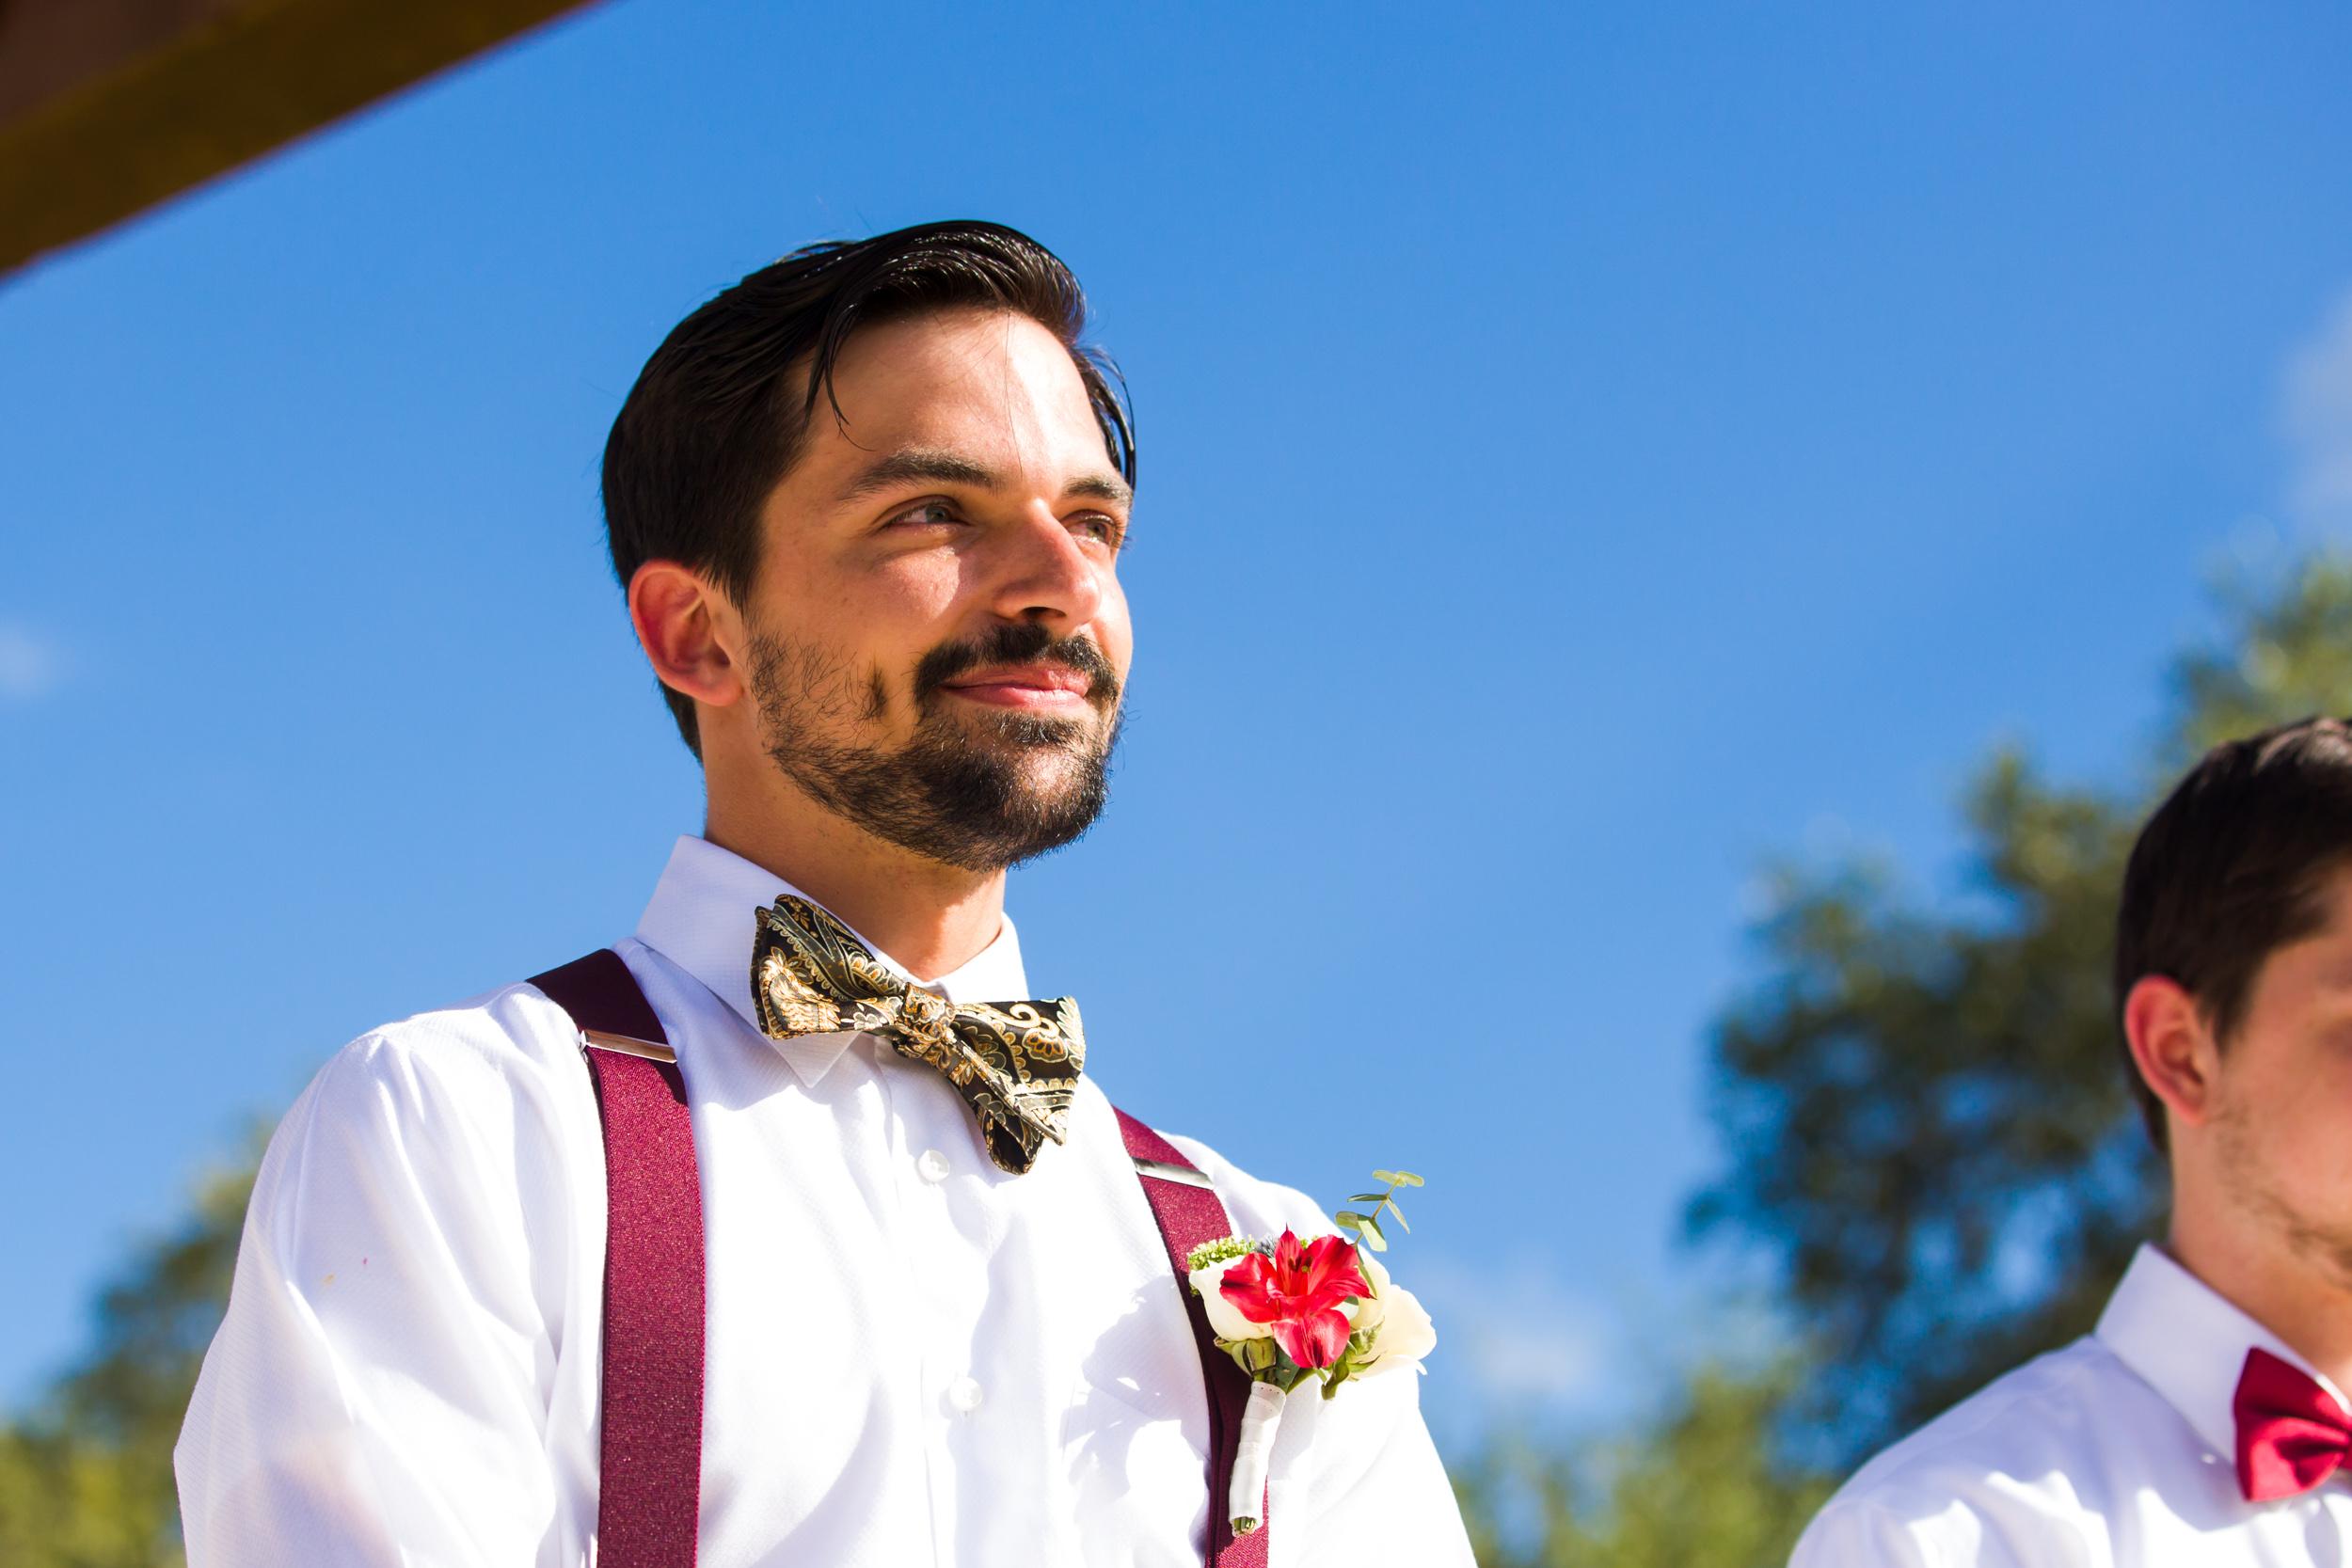 austin-wedding-colorful-22.jpg